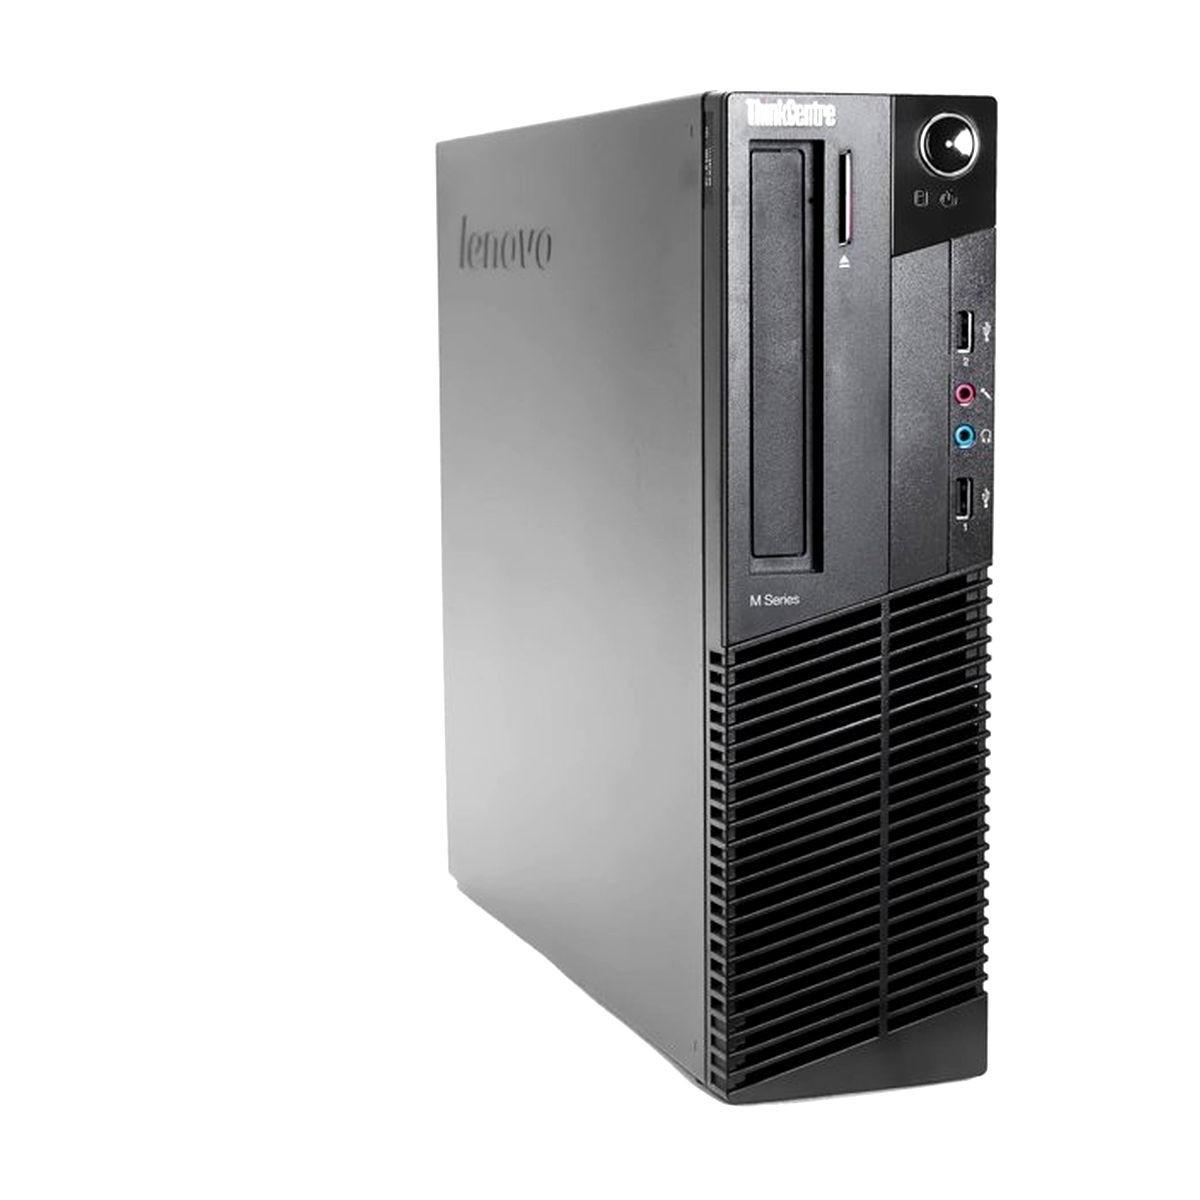 LENOVO M93p SFF G3220 4GB 250GB SATA WiFi W10 PRO